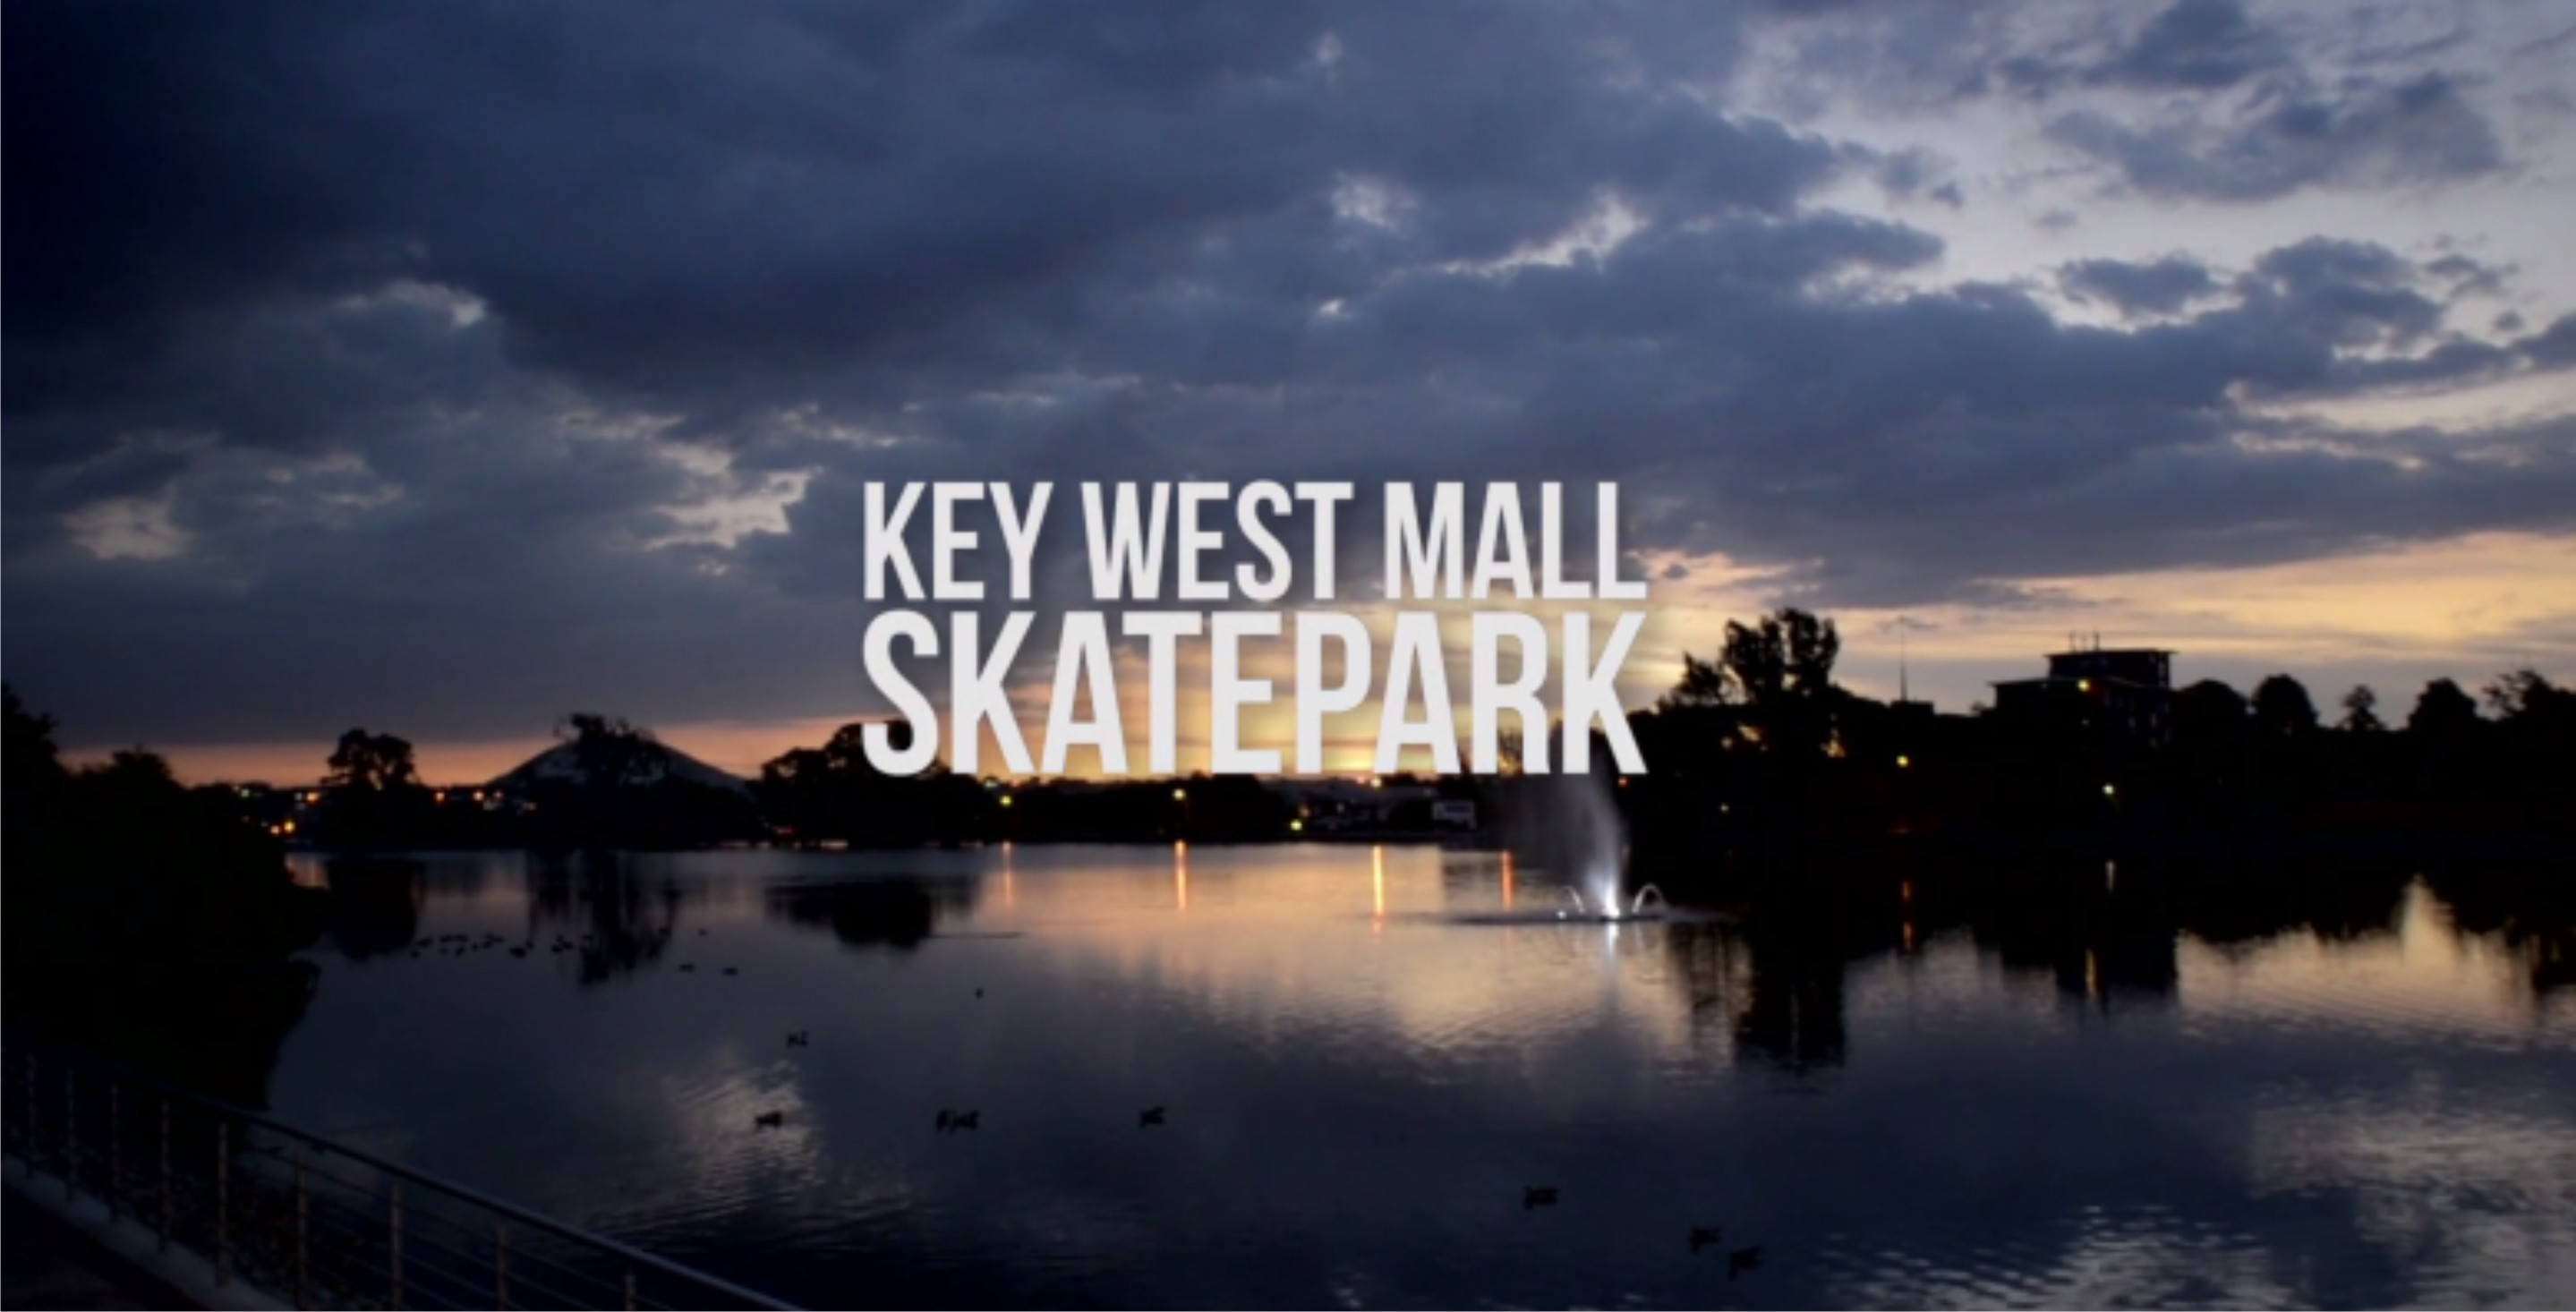 Key West Mall Skatepark Spotcheck featuring BMX and Skateboarding